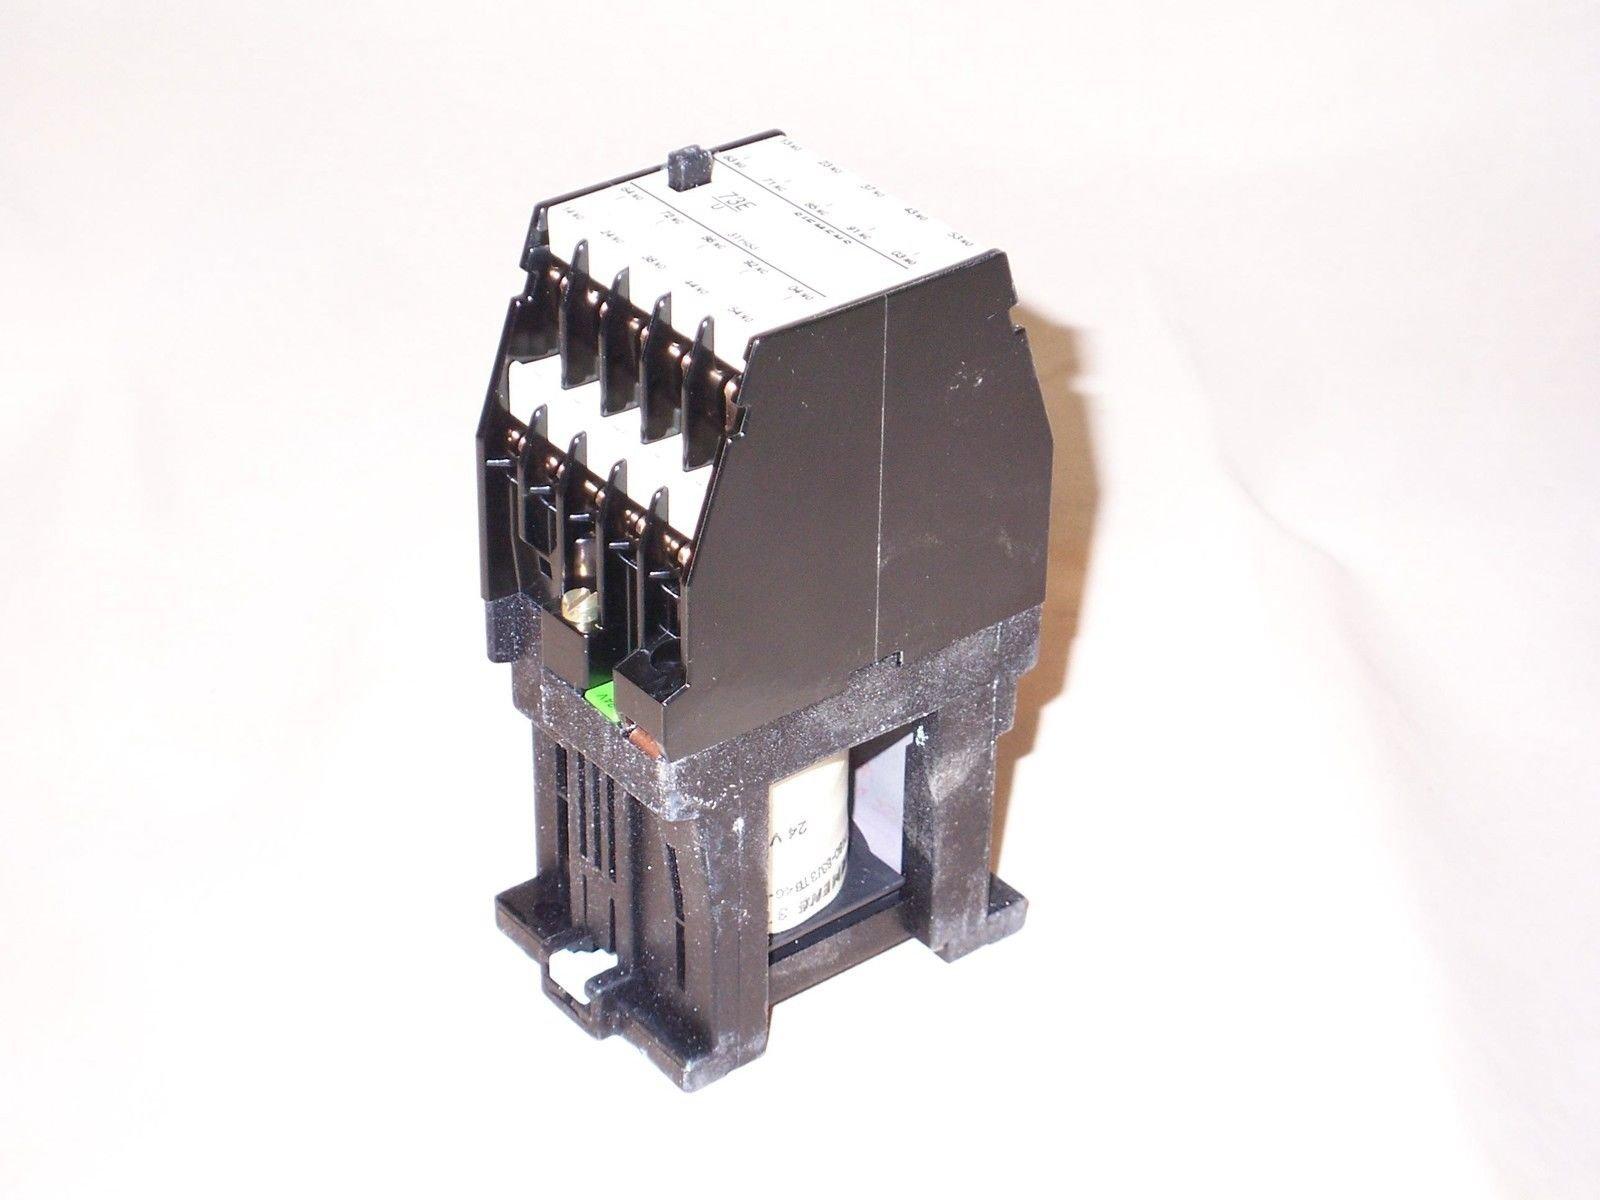 Siemens 3TH8346-0BB4 contactor relay 24VDC